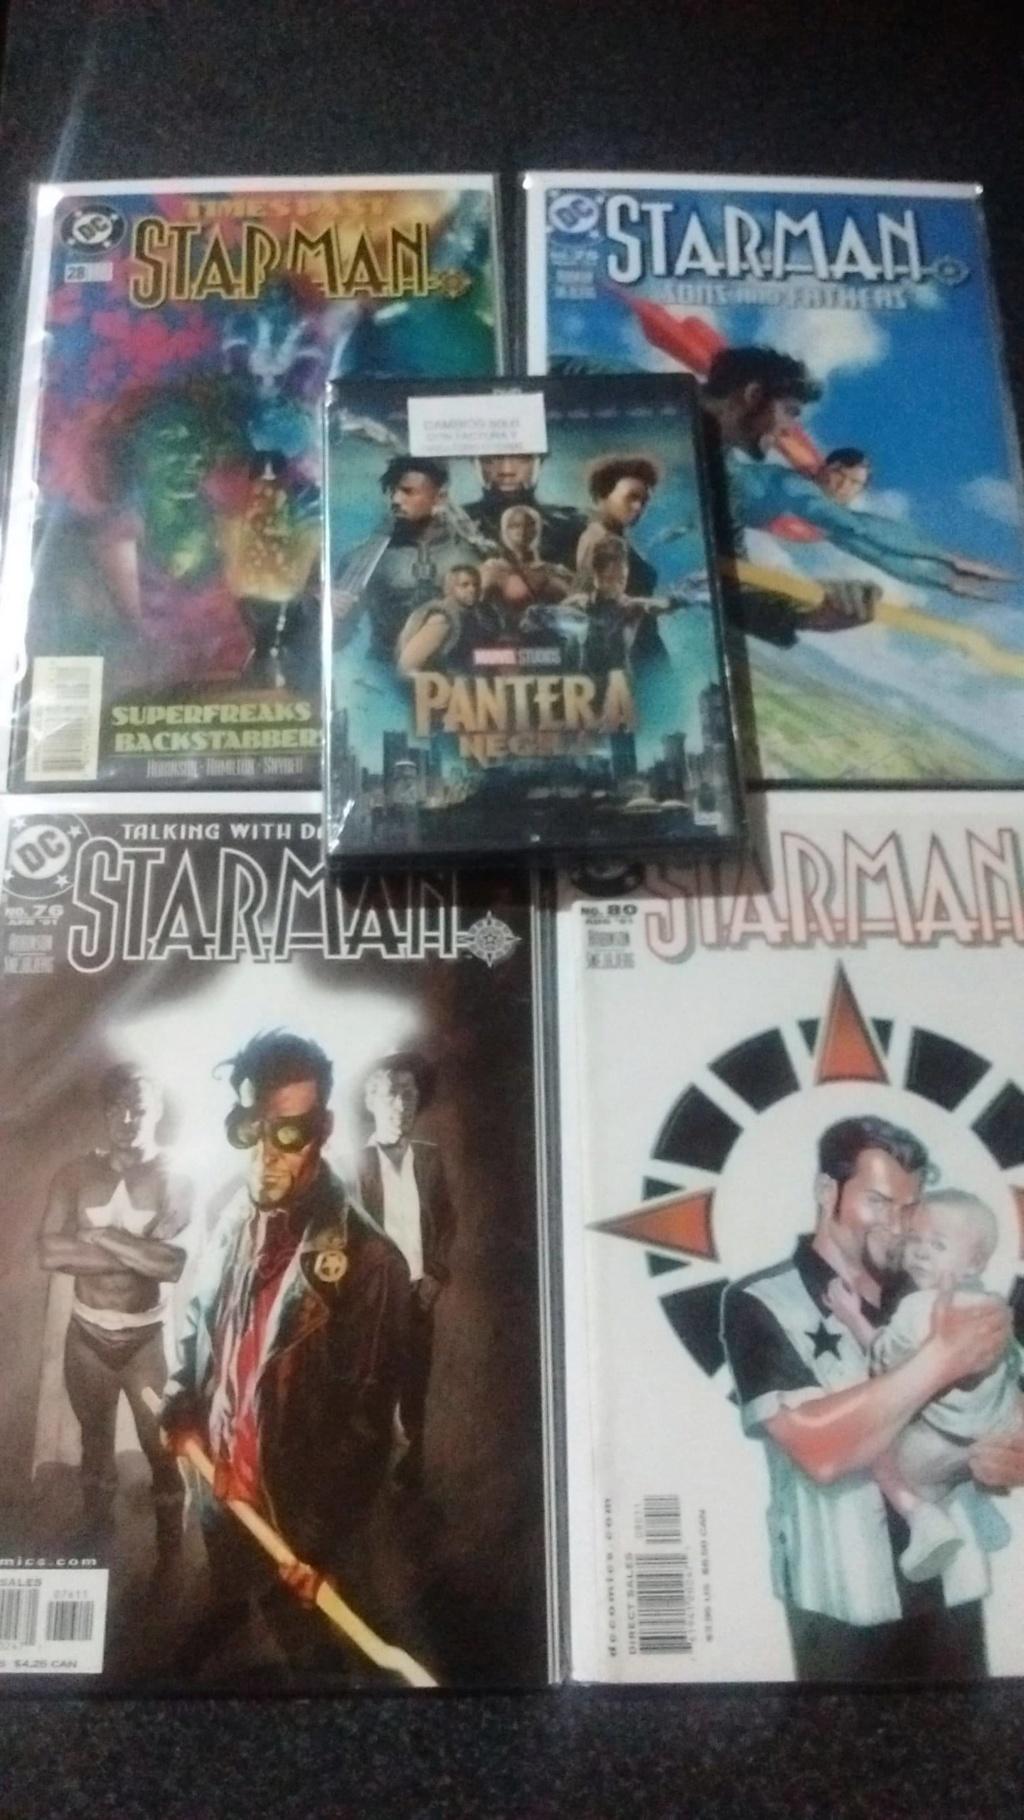 [Comics] Siguen las adquisiciones 2019 - Página 2 54367010